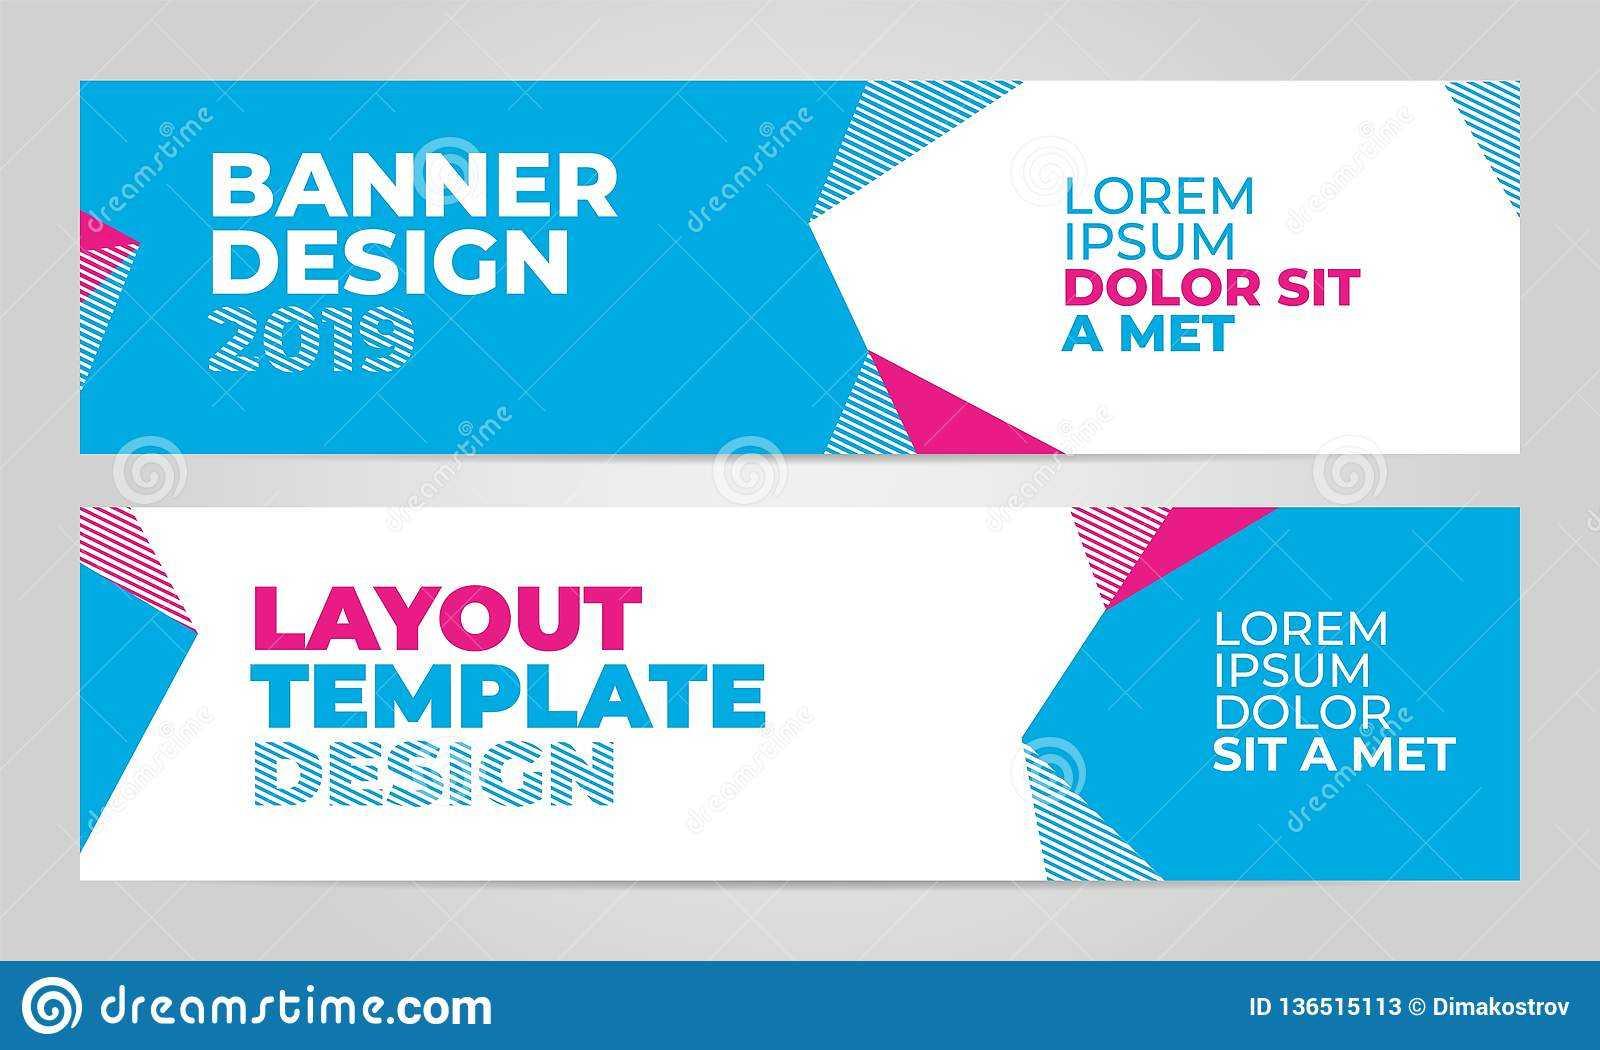 Layout Banner Template Design For Winter Sport Event 2019 Regarding Event Banner Template